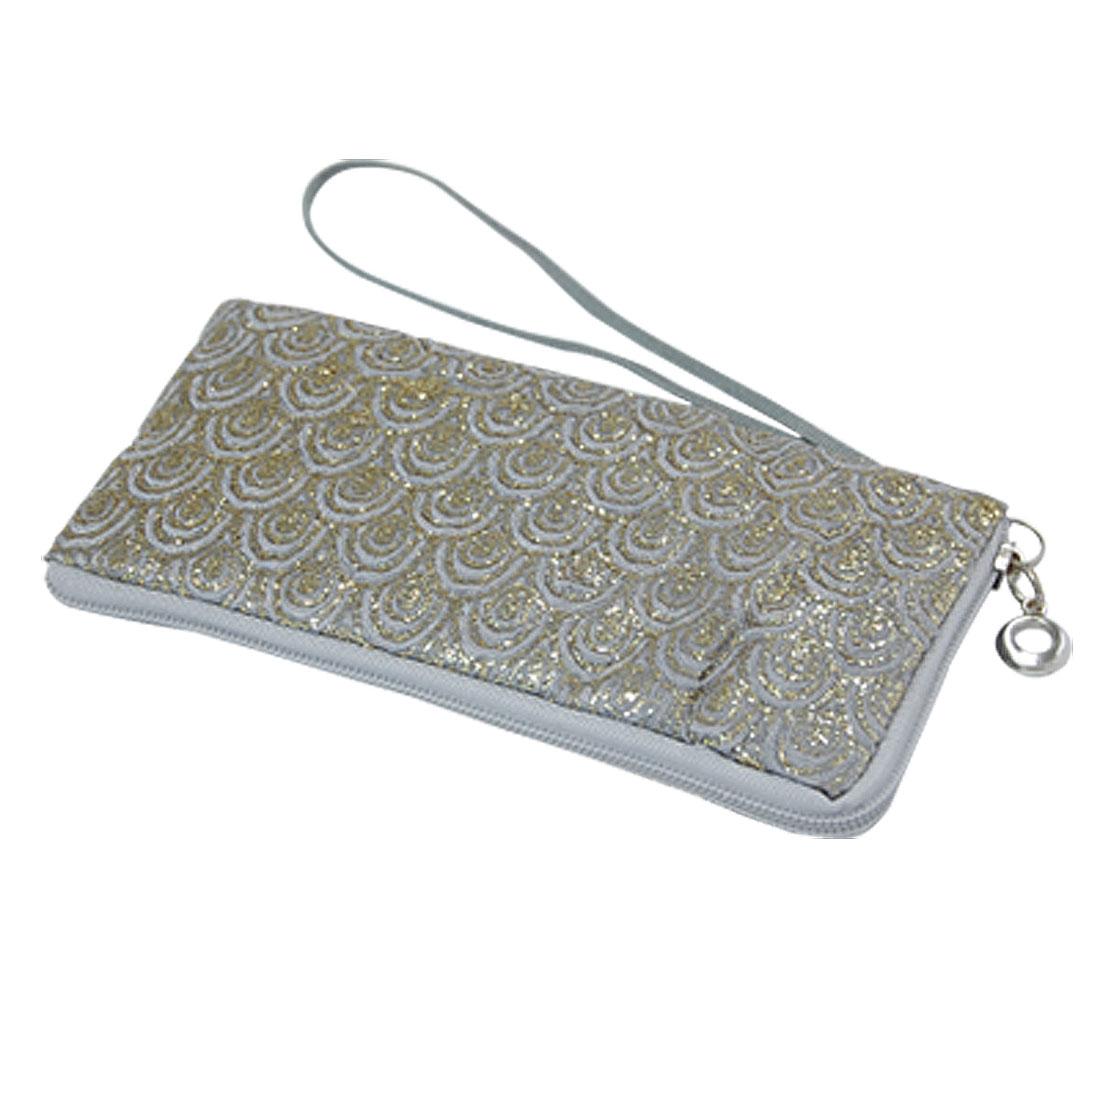 Silver Tone Glittery Nylon Flower Print Cell Phone Bag